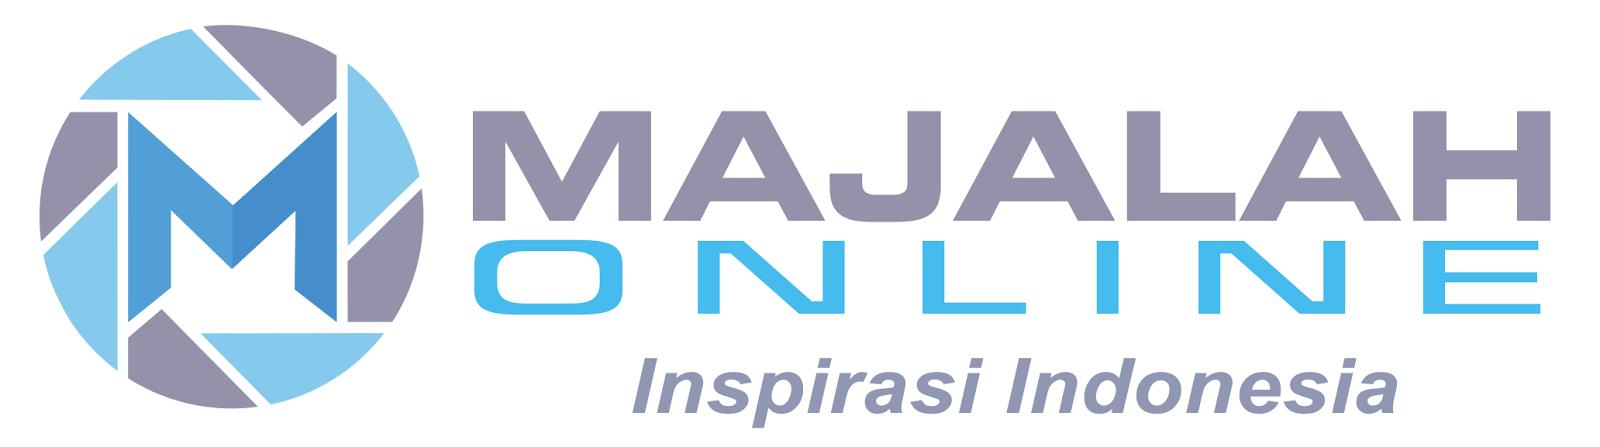 Majalah Online | Inspirasi Indonesia